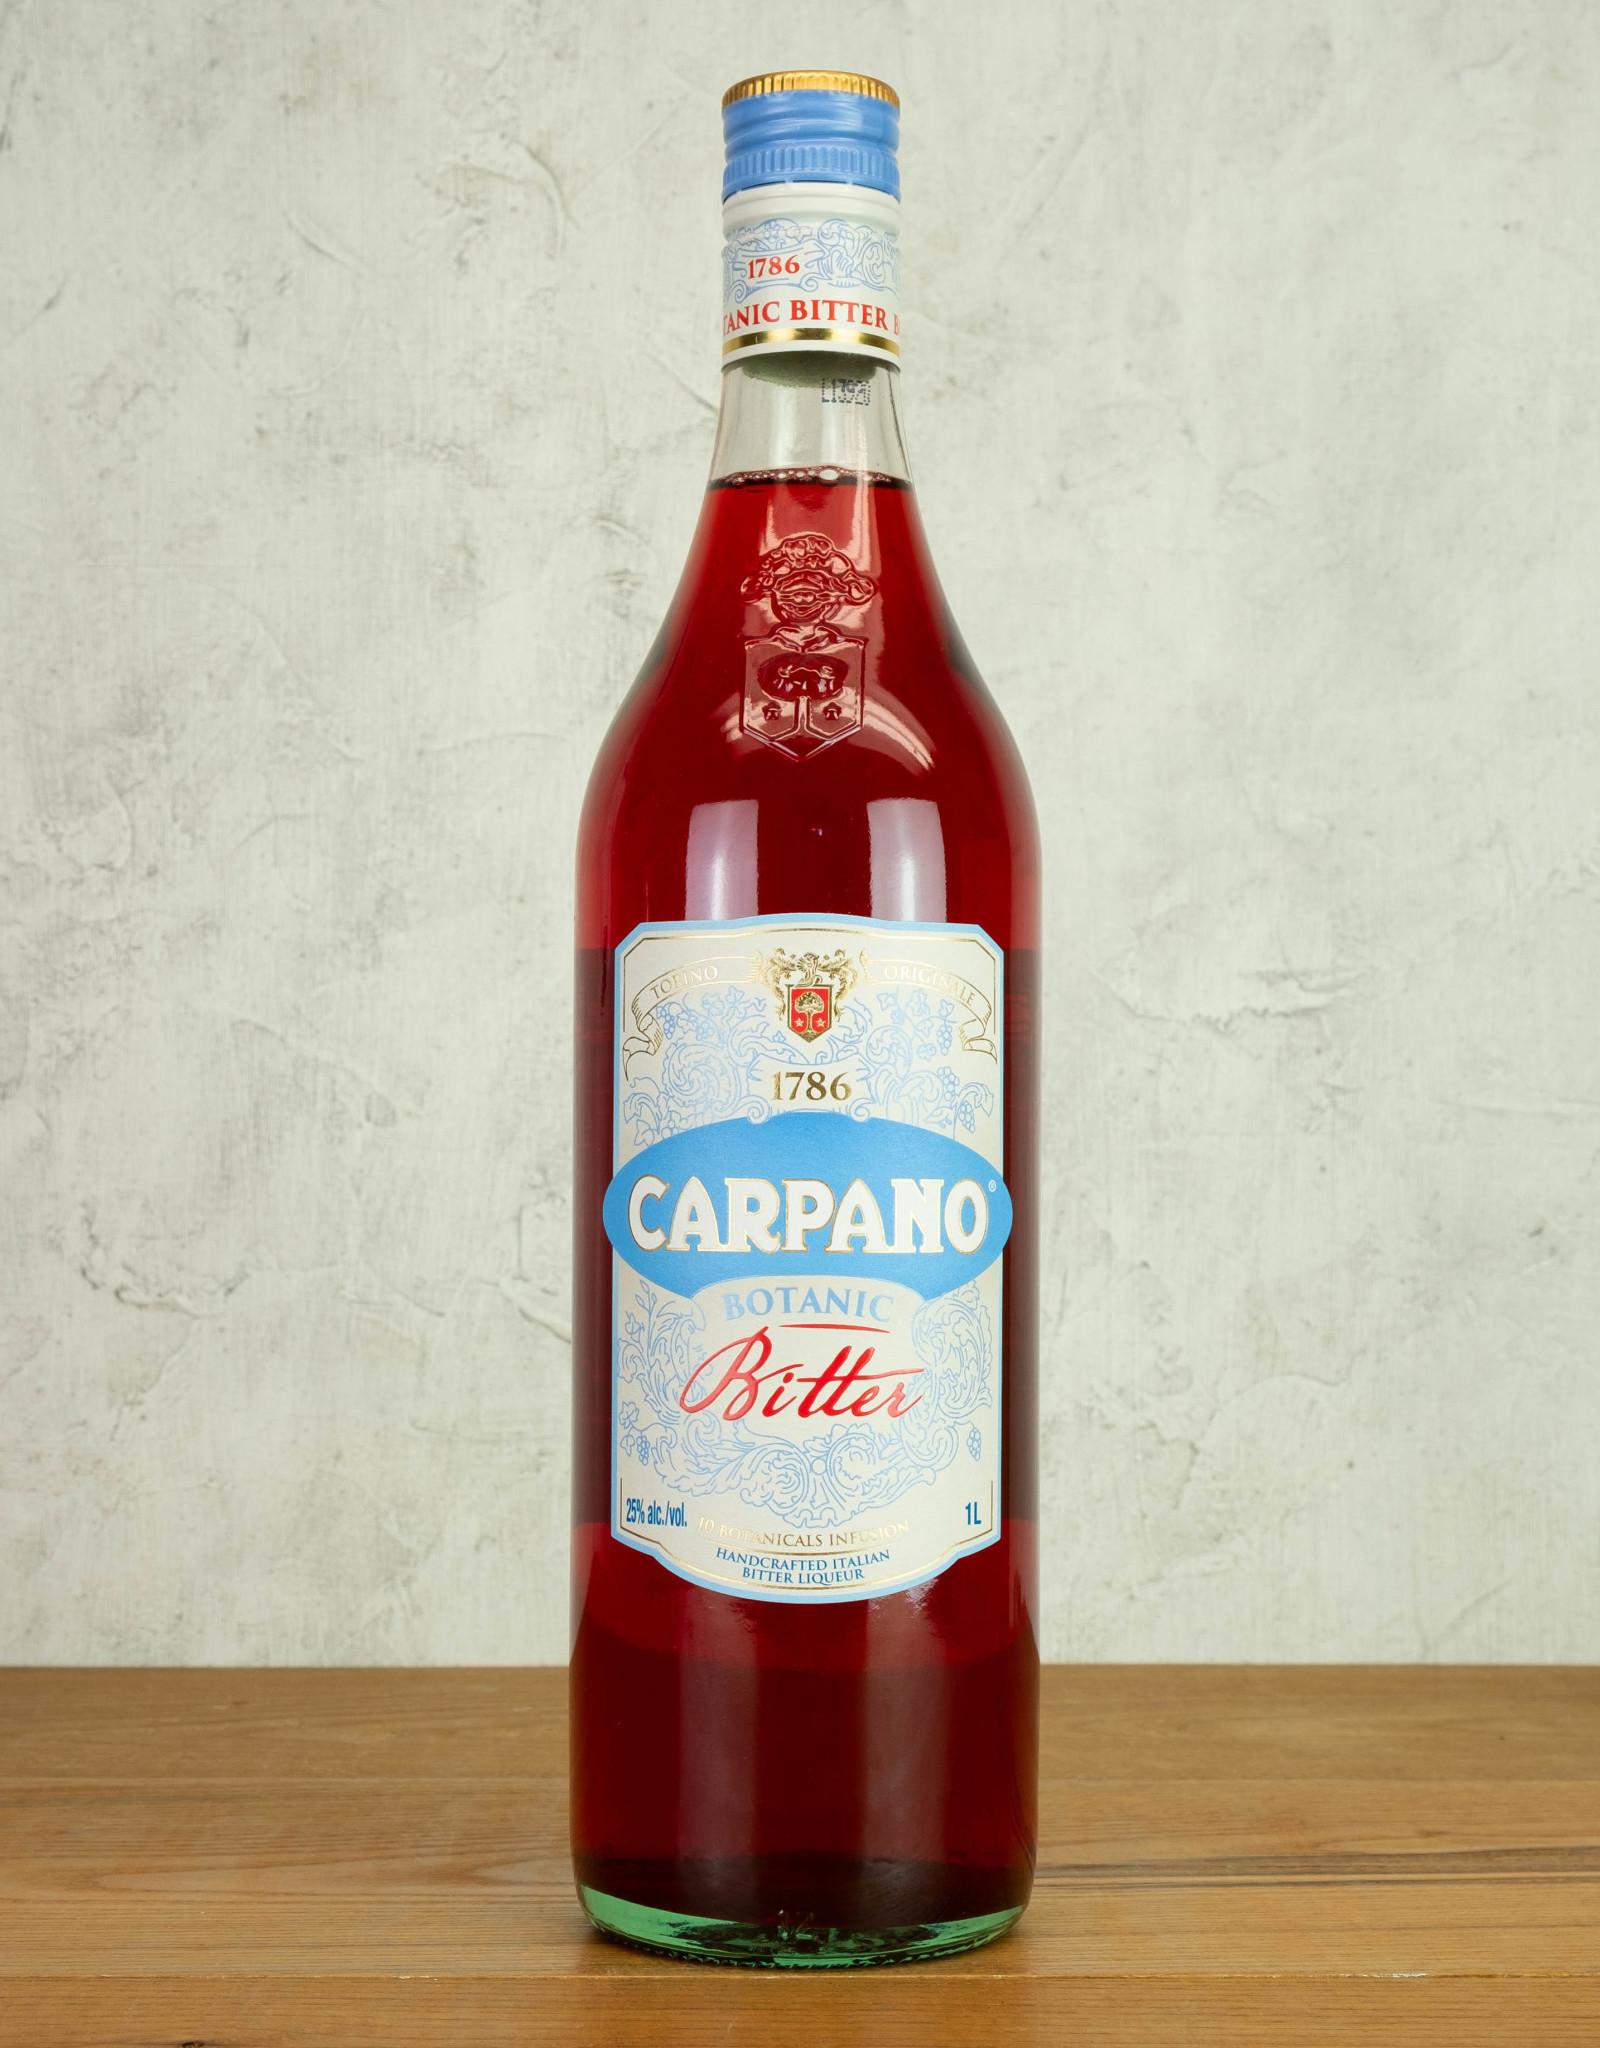 Carpano Botanic Bitter